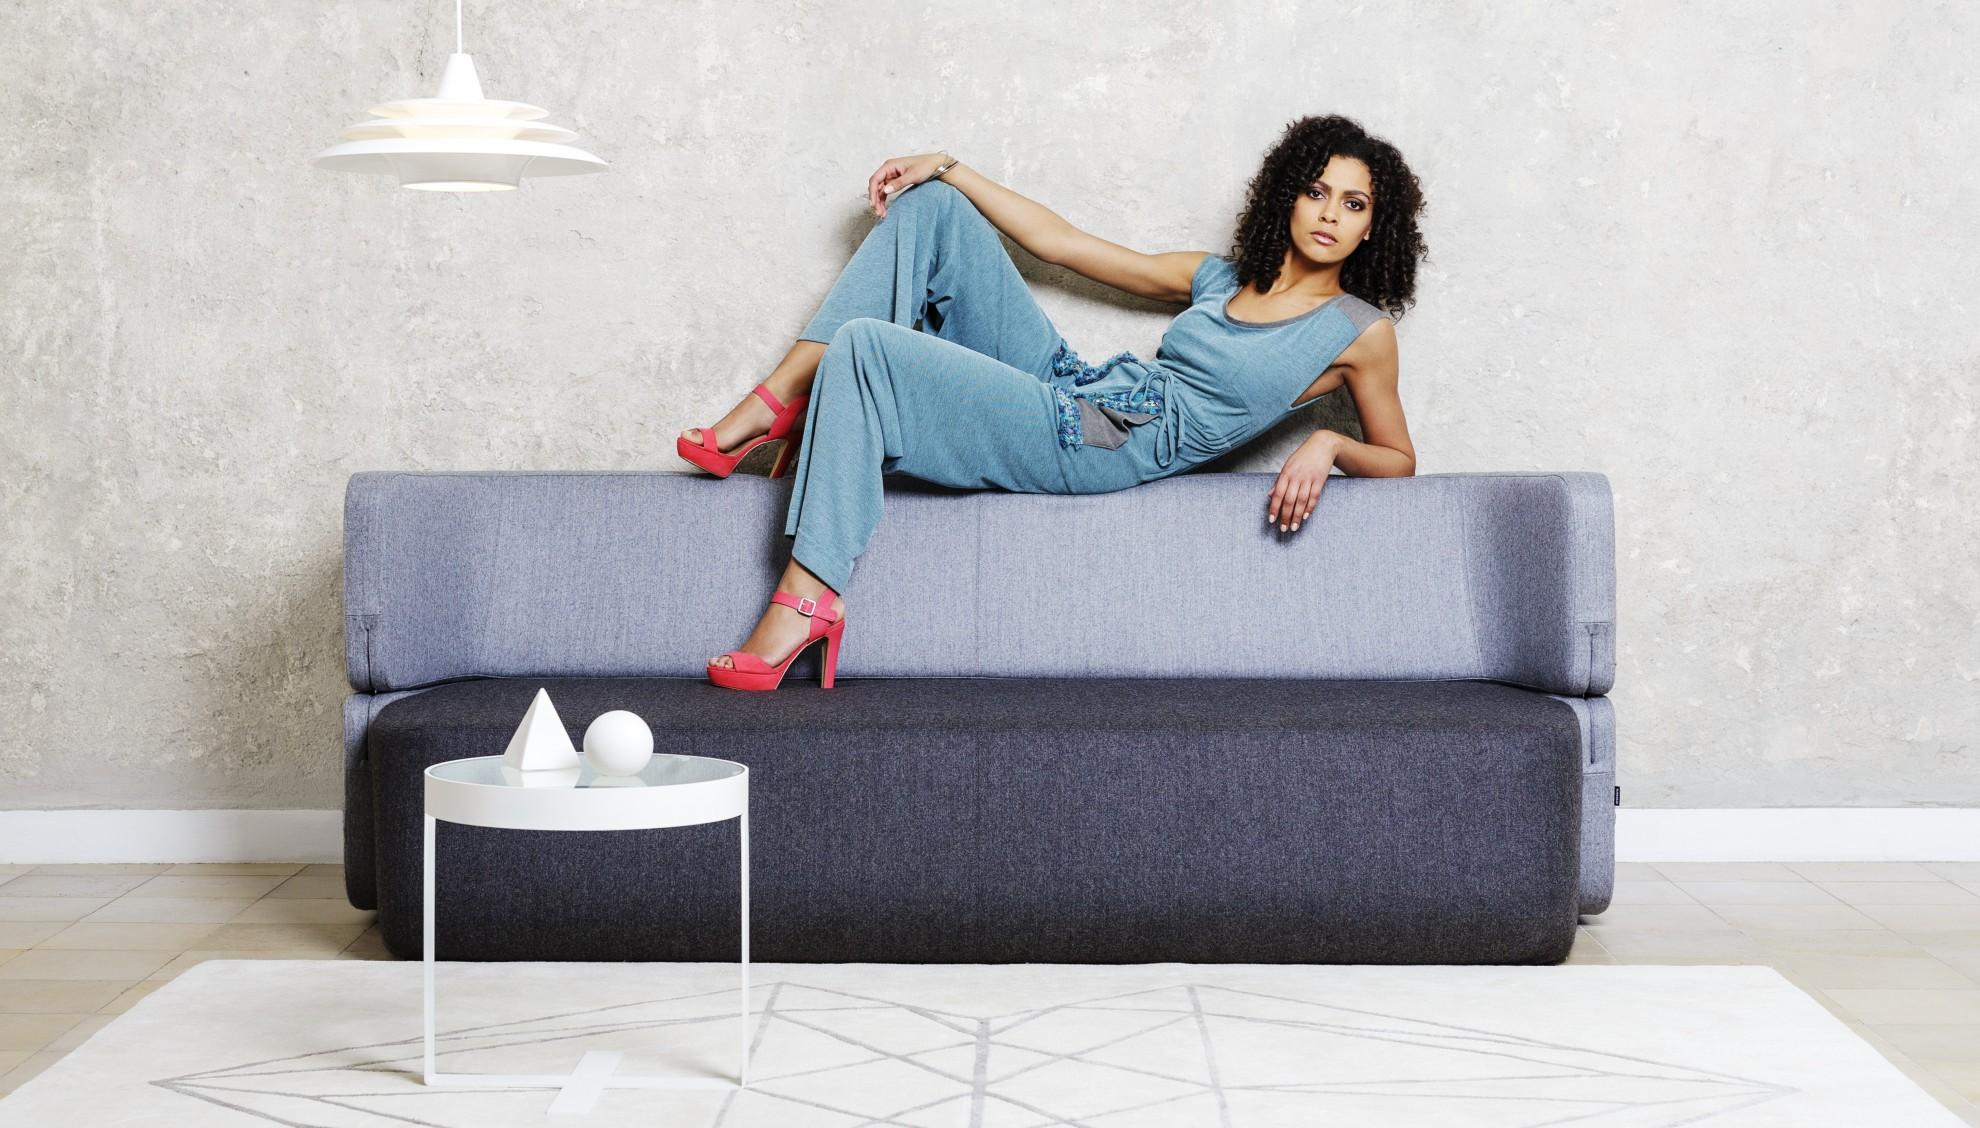 startseite living wohndesign. Black Bedroom Furniture Sets. Home Design Ideas